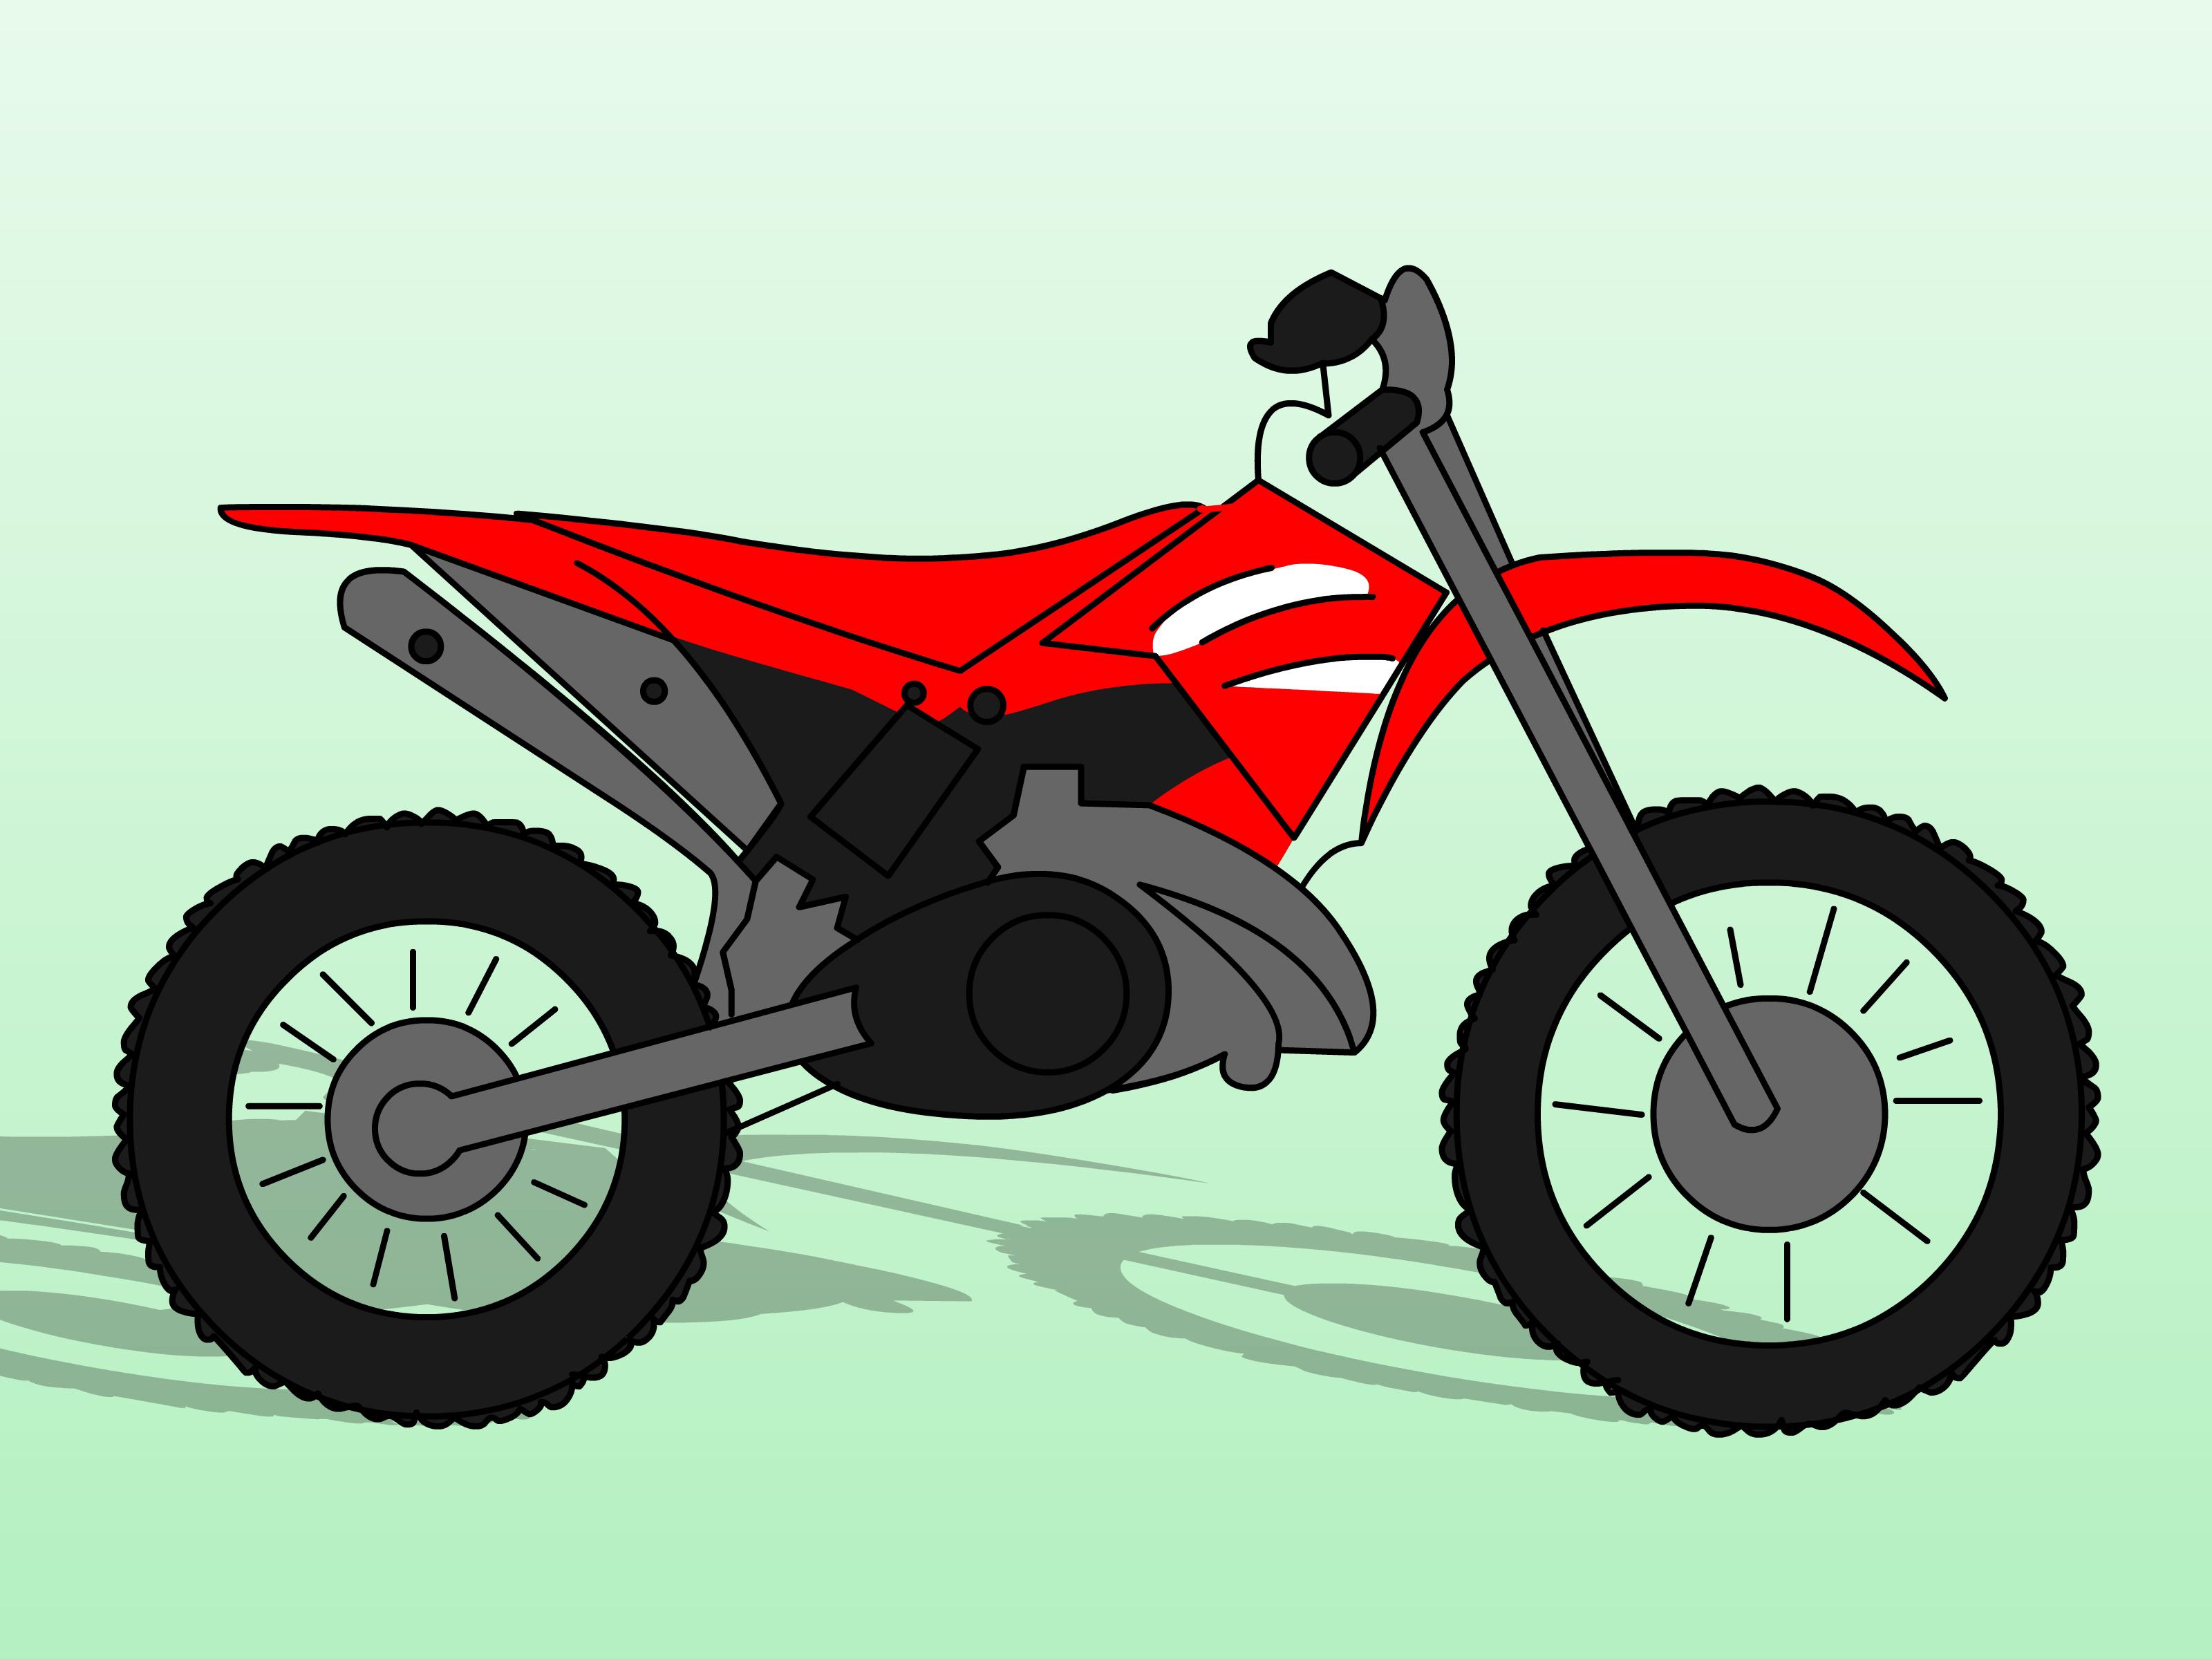 Drawn bike easy Dirt Bikes Dirt Draw sharpener